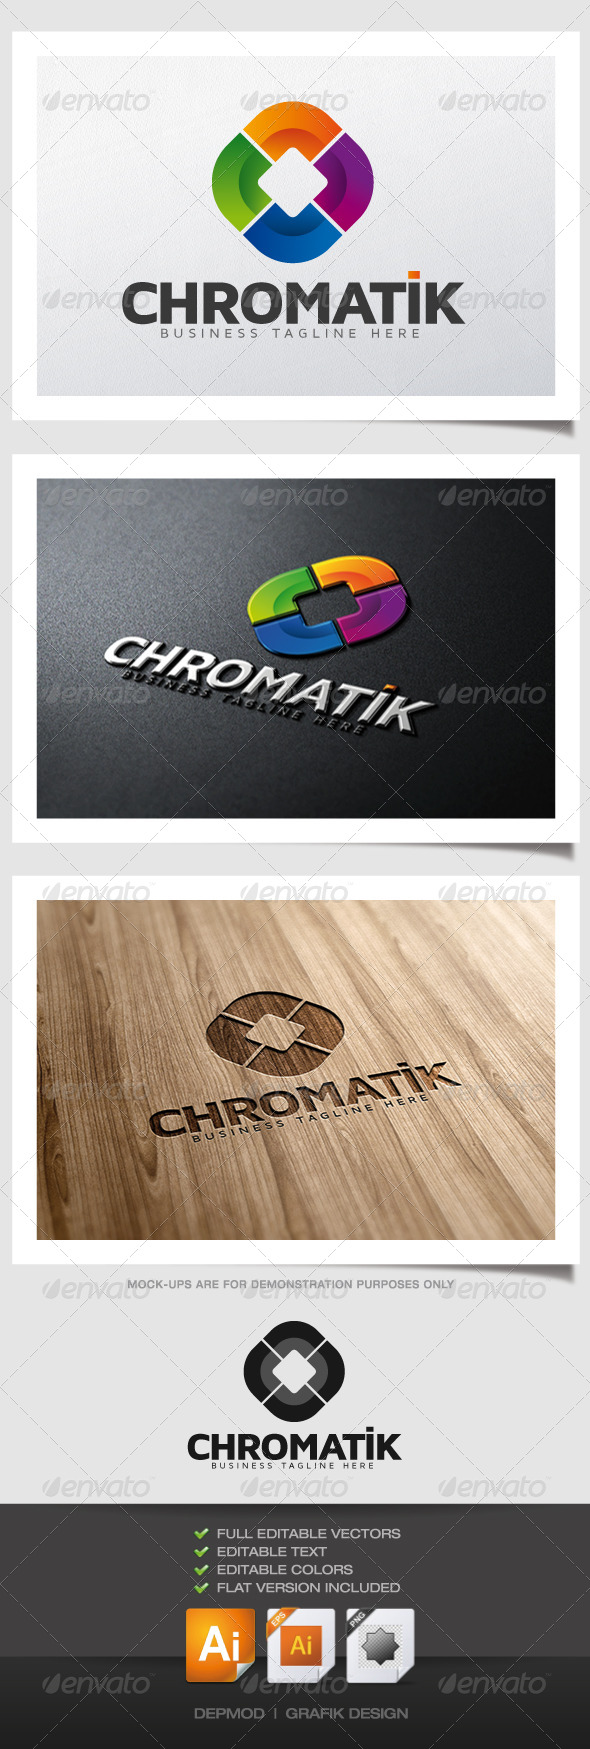 Chromatik Logo - Abstract Logo Templates